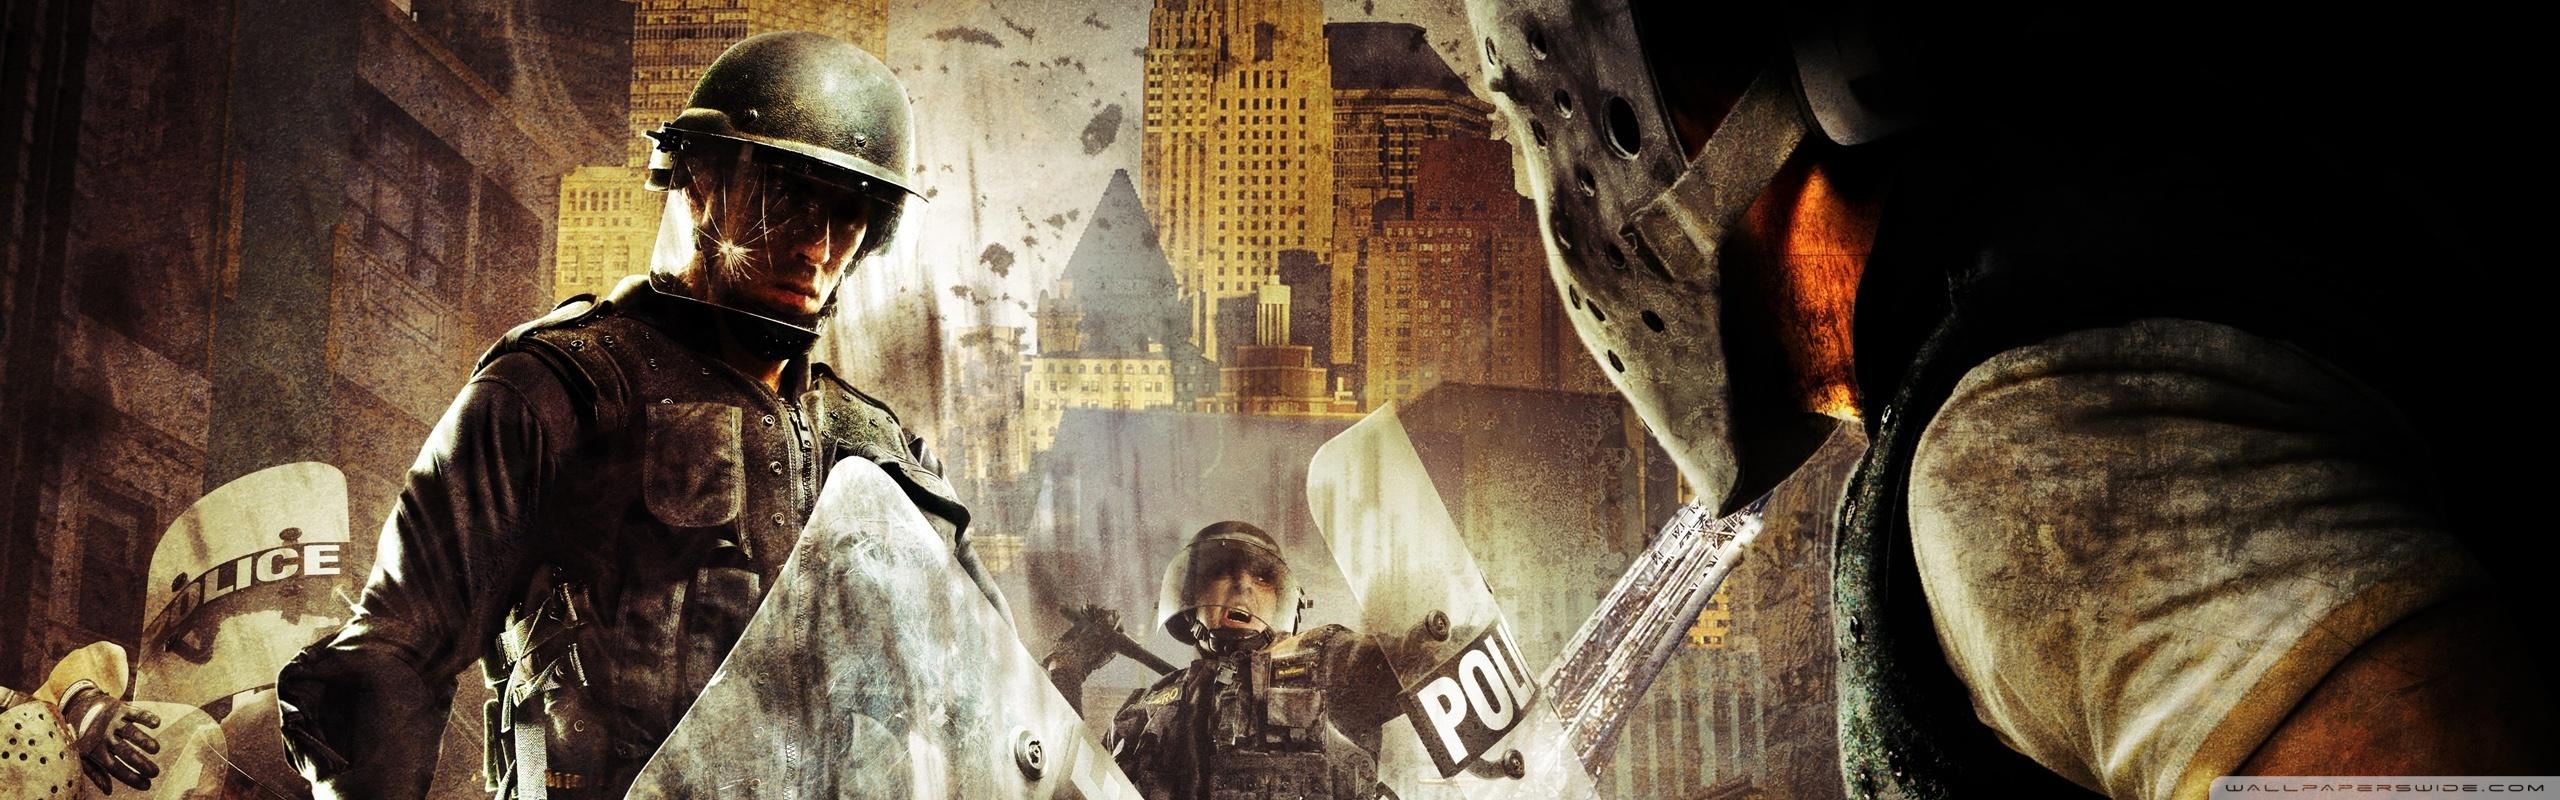 Chaos Riot Urban Response Wallpaper